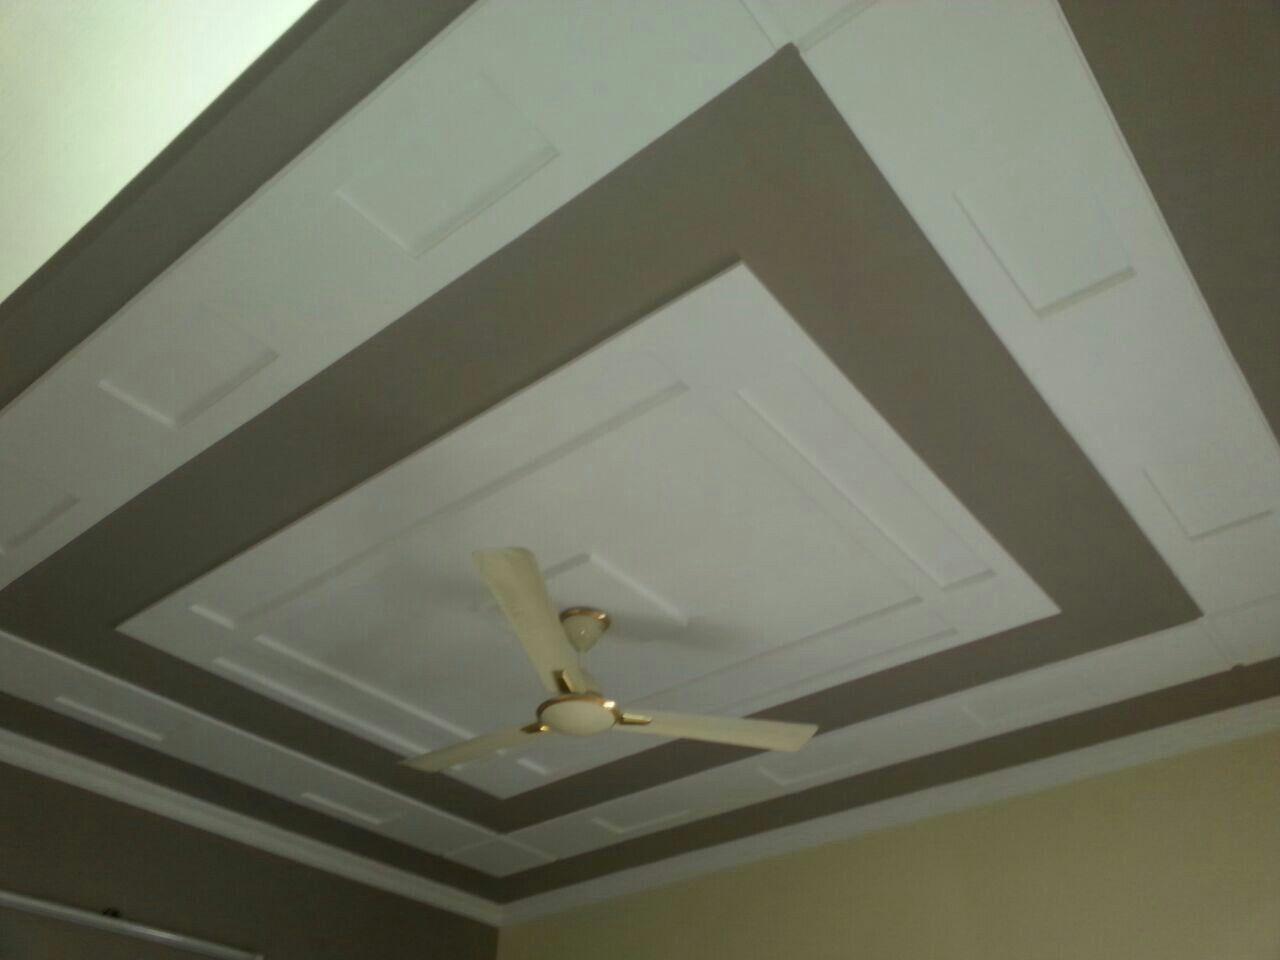 Pop Plus Minus Ceiling Design Modern Pop Ceiling Design Ceiling Design